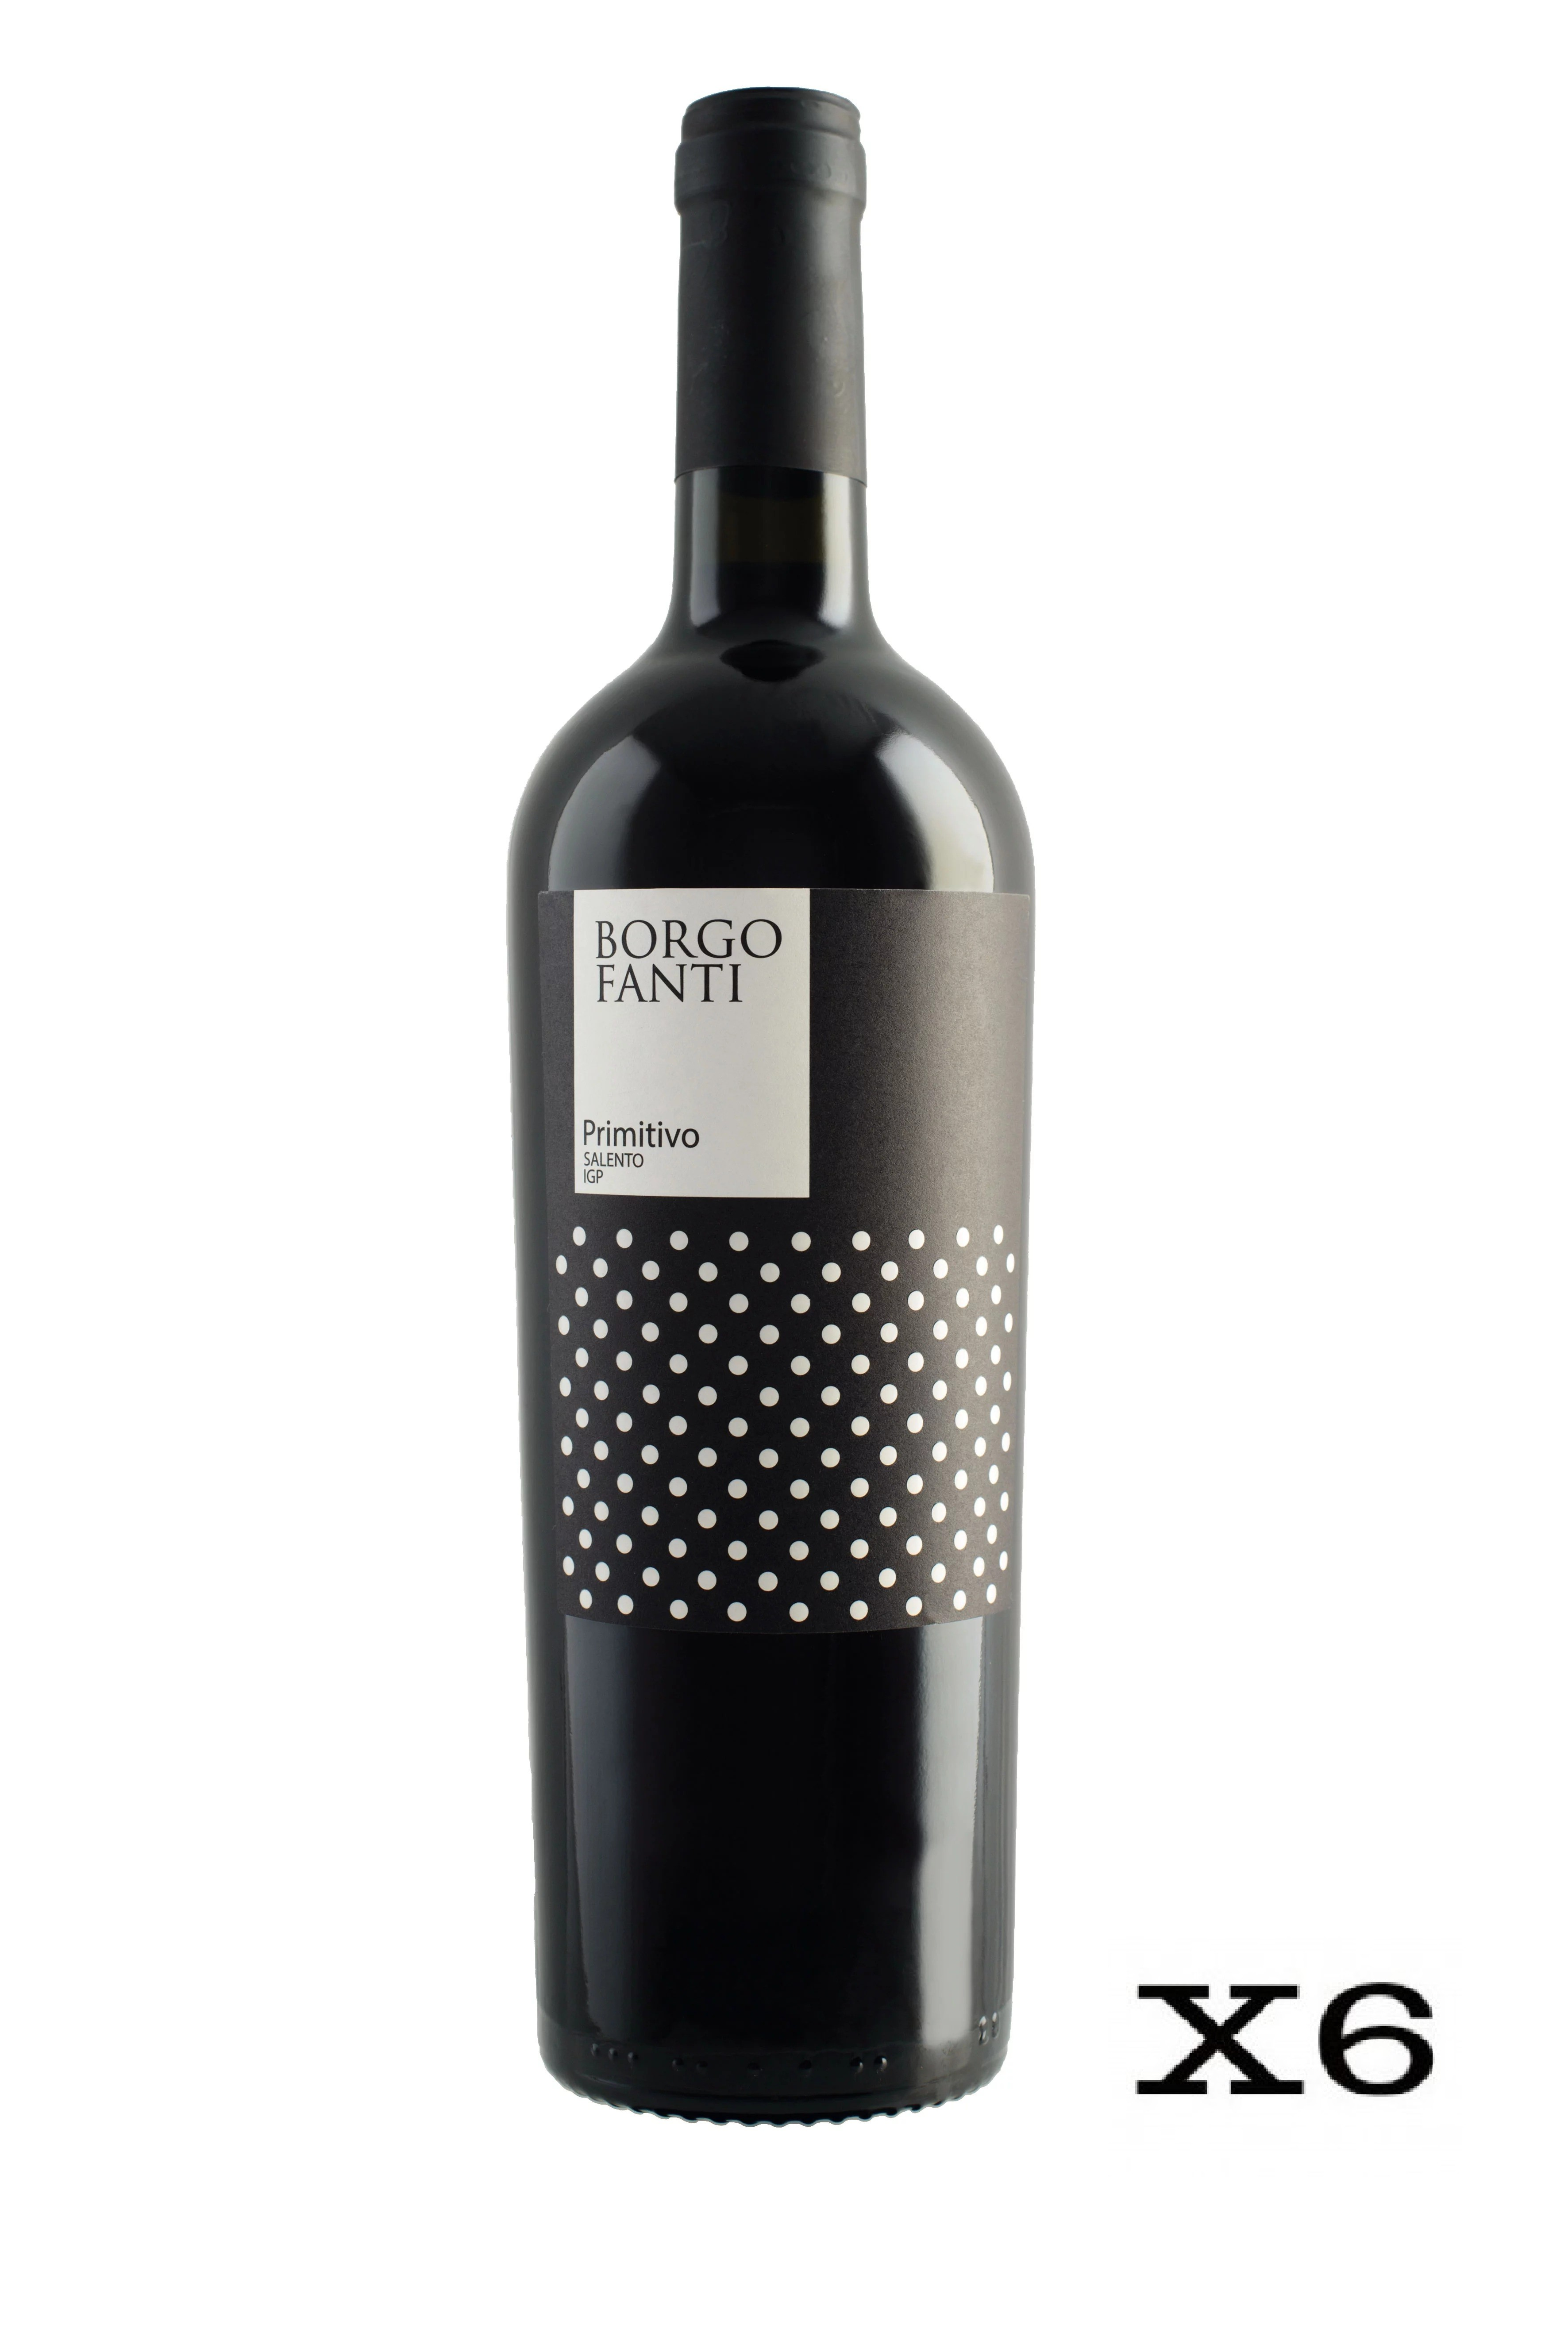 Borgofanti Primitivo IGP Puglia - 6 bottiglie da 75cl